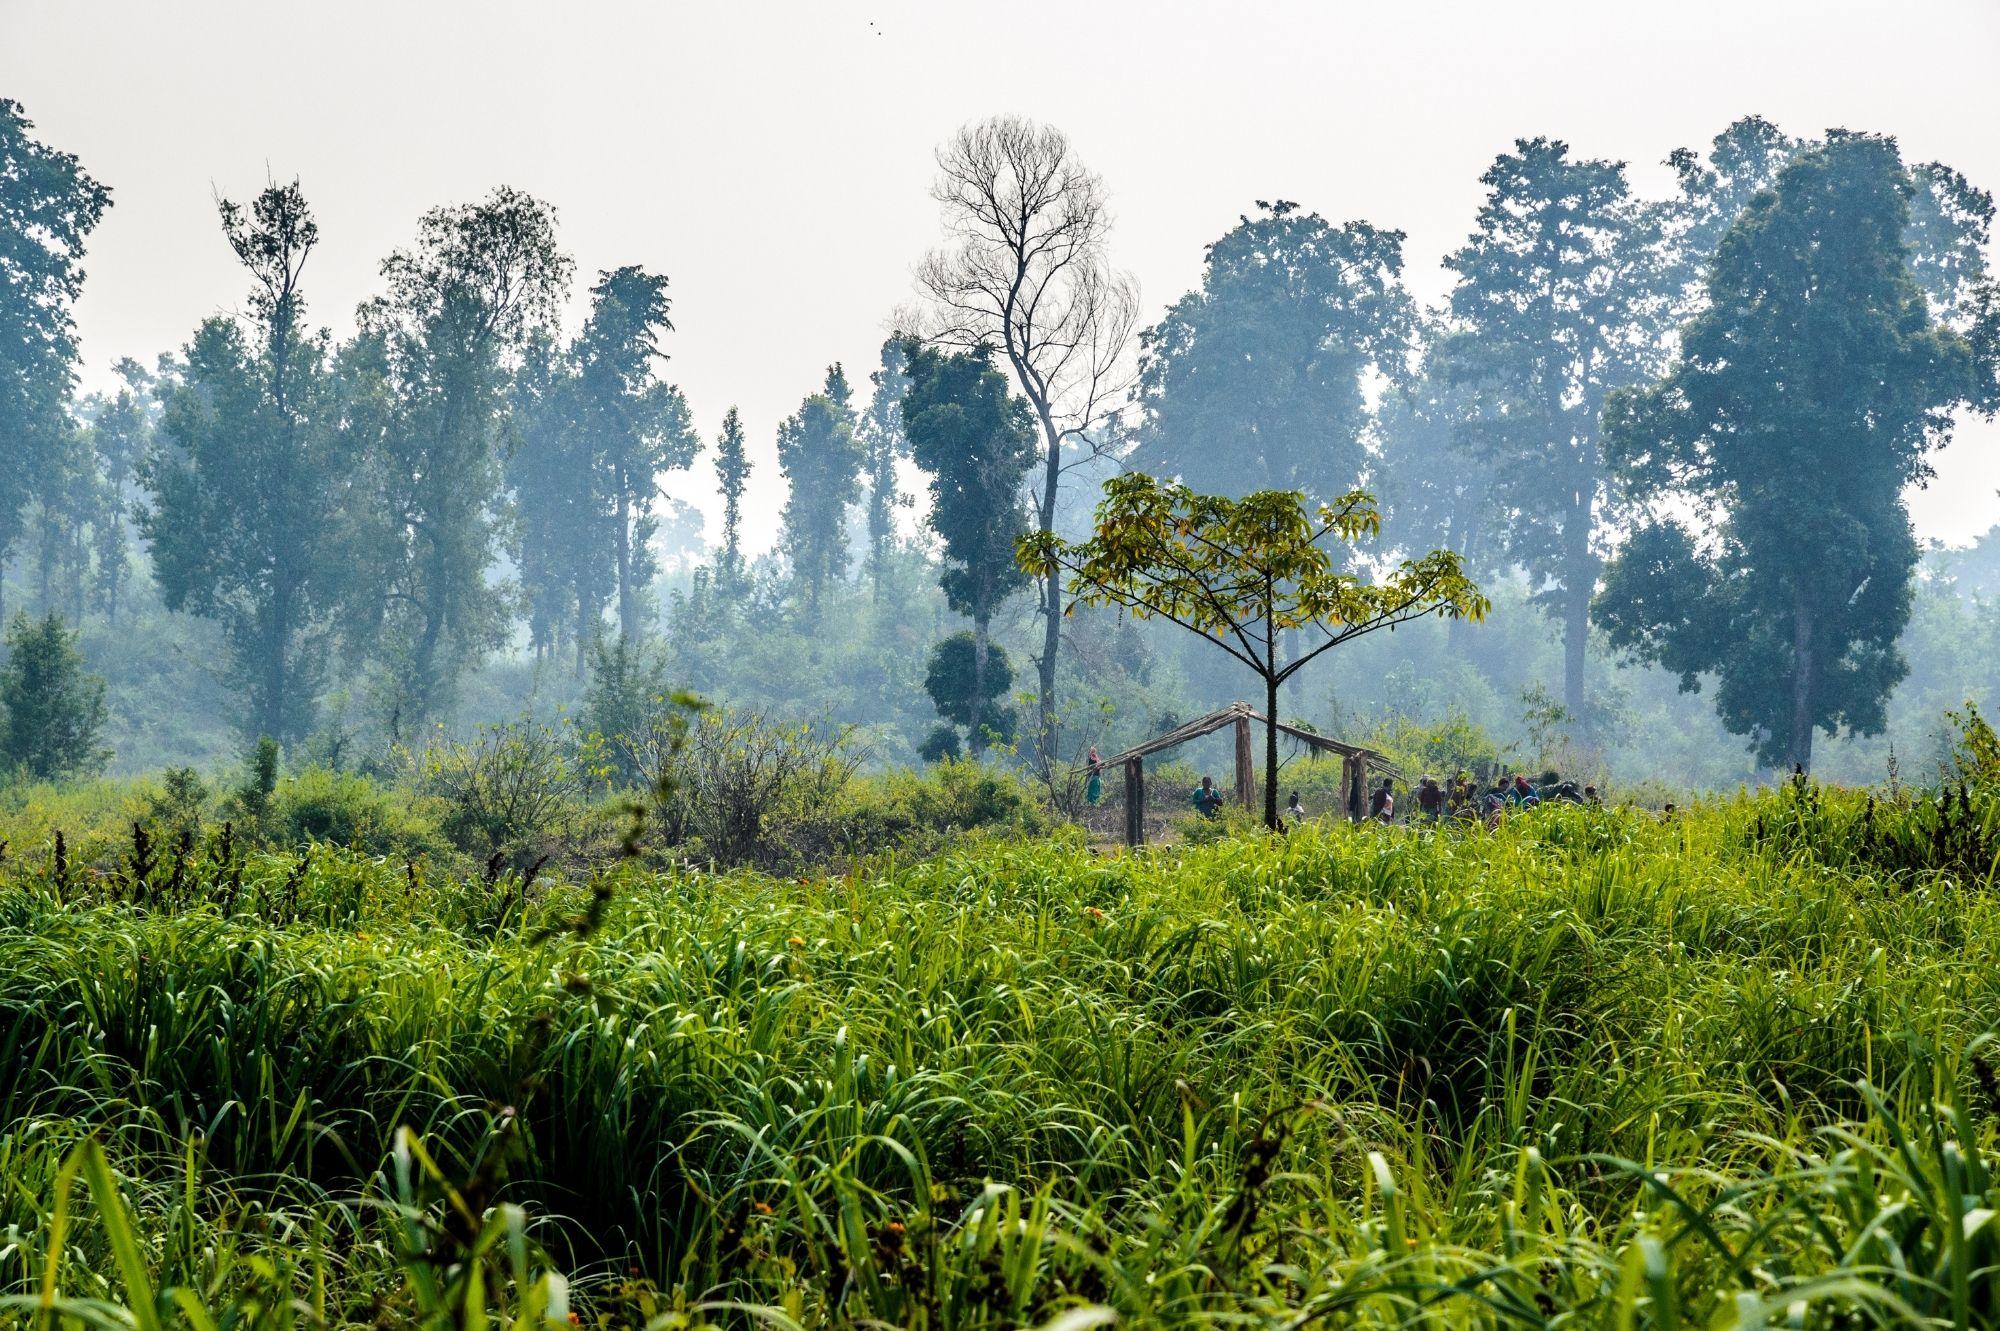 2. Habitat Management and Restoration